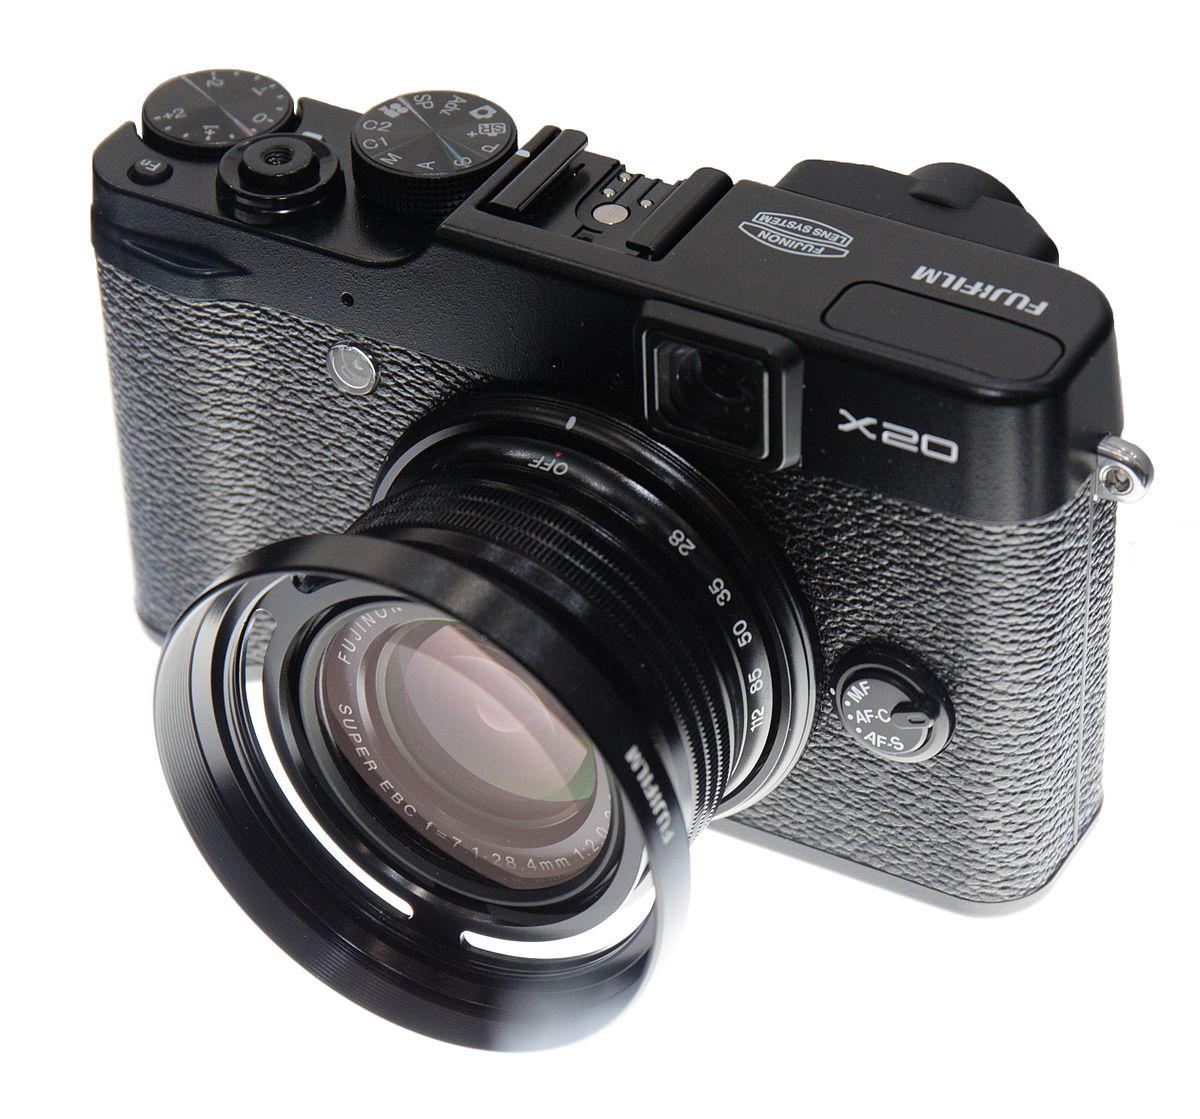 Fujifilm X20 Camera Drivers for Windows Mac